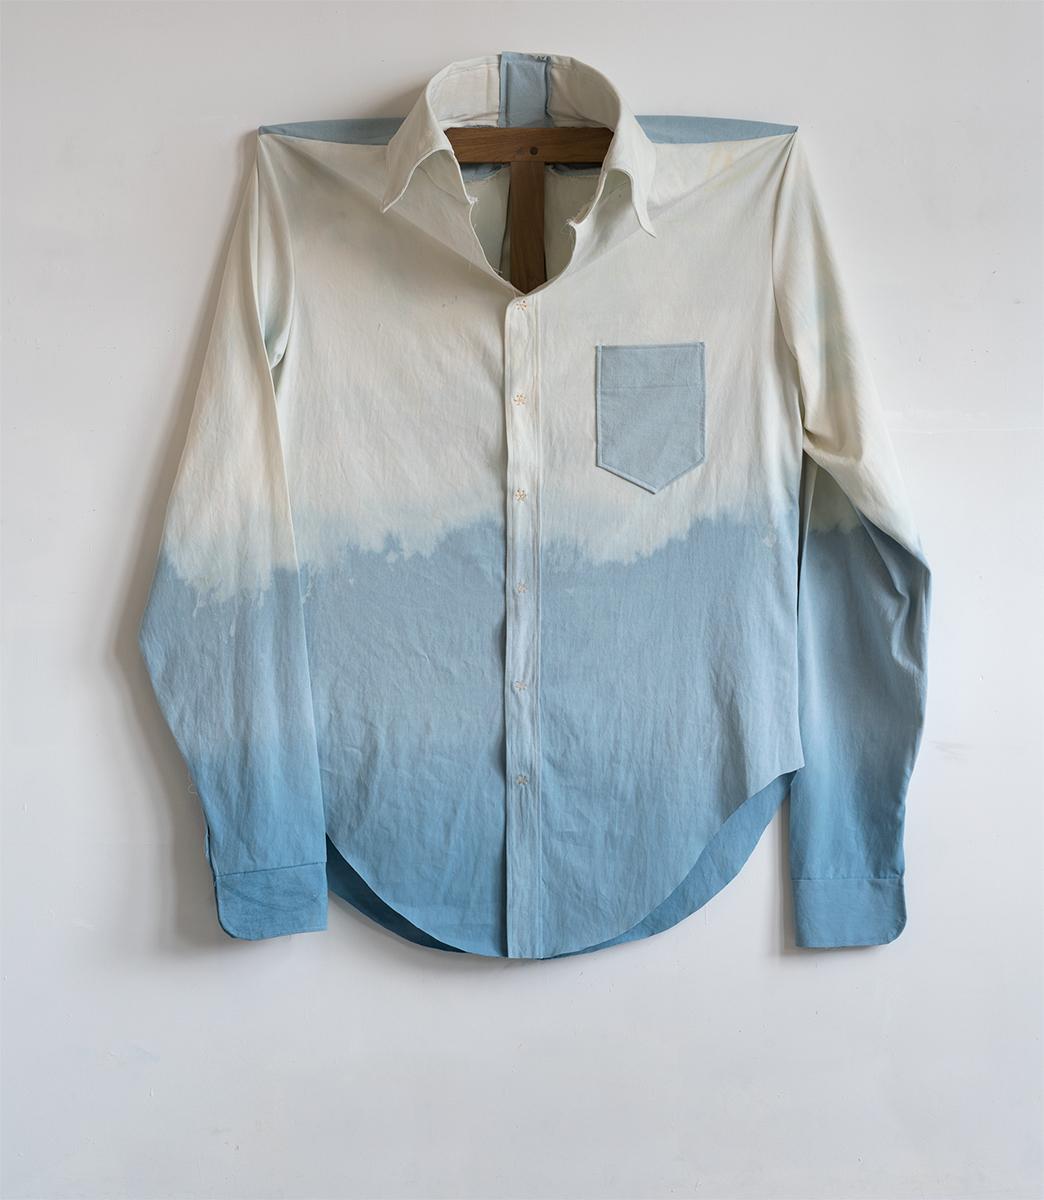 Denim Gradient, 2015 157,5 x 139,7 x 31 cm Cotton on Walnut Frame